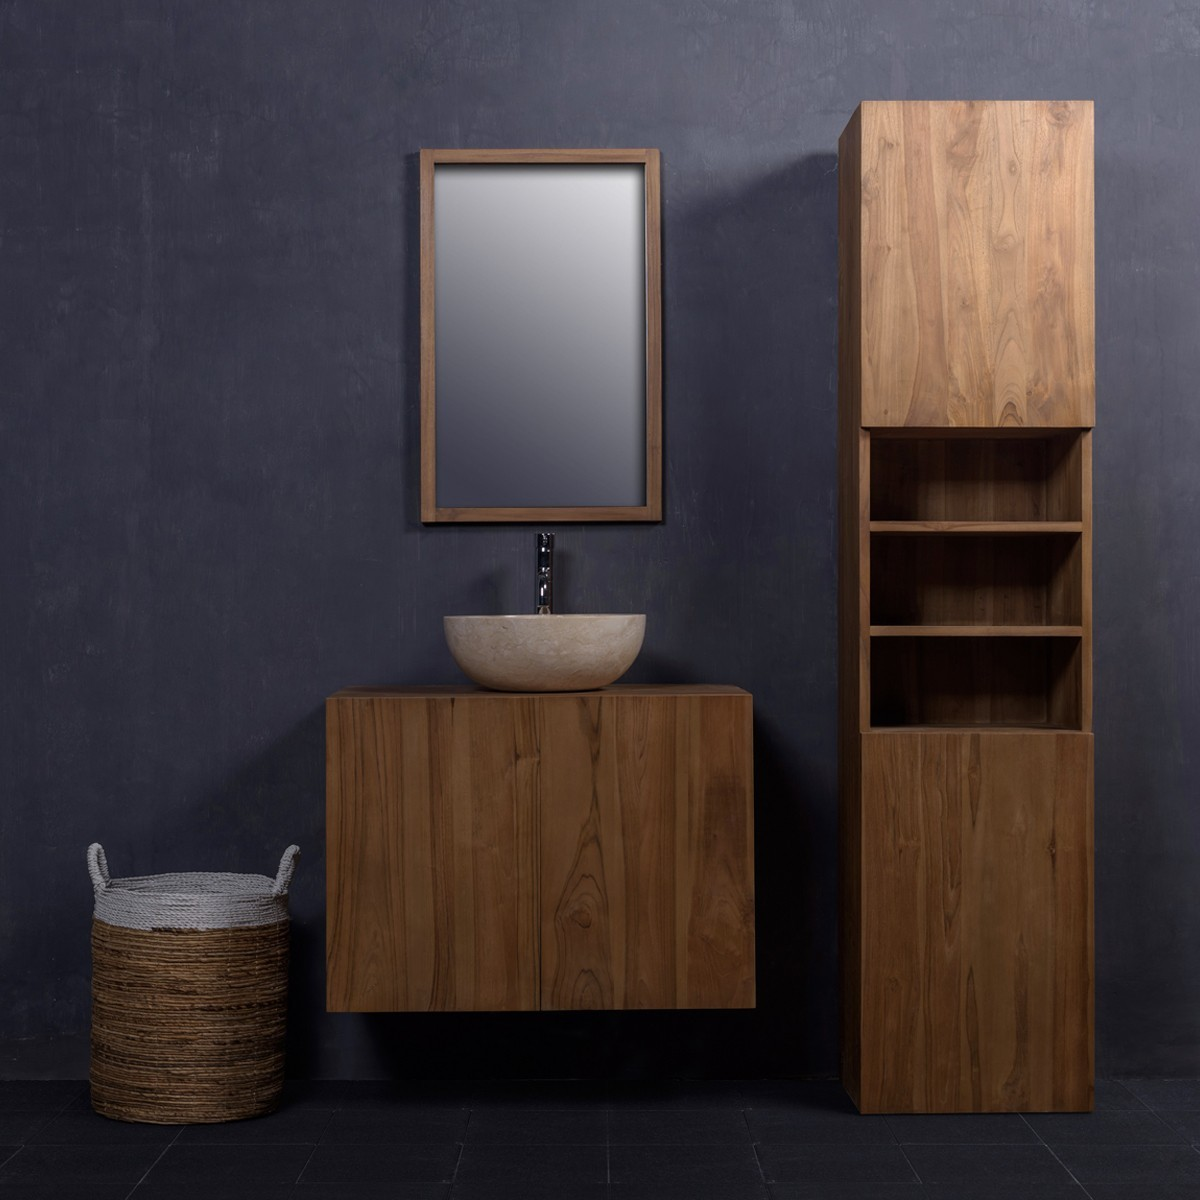 ensemble de salle de bain en bois de teck meuble de salle de bain teck 80 meuble colonne. Black Bedroom Furniture Sets. Home Design Ideas